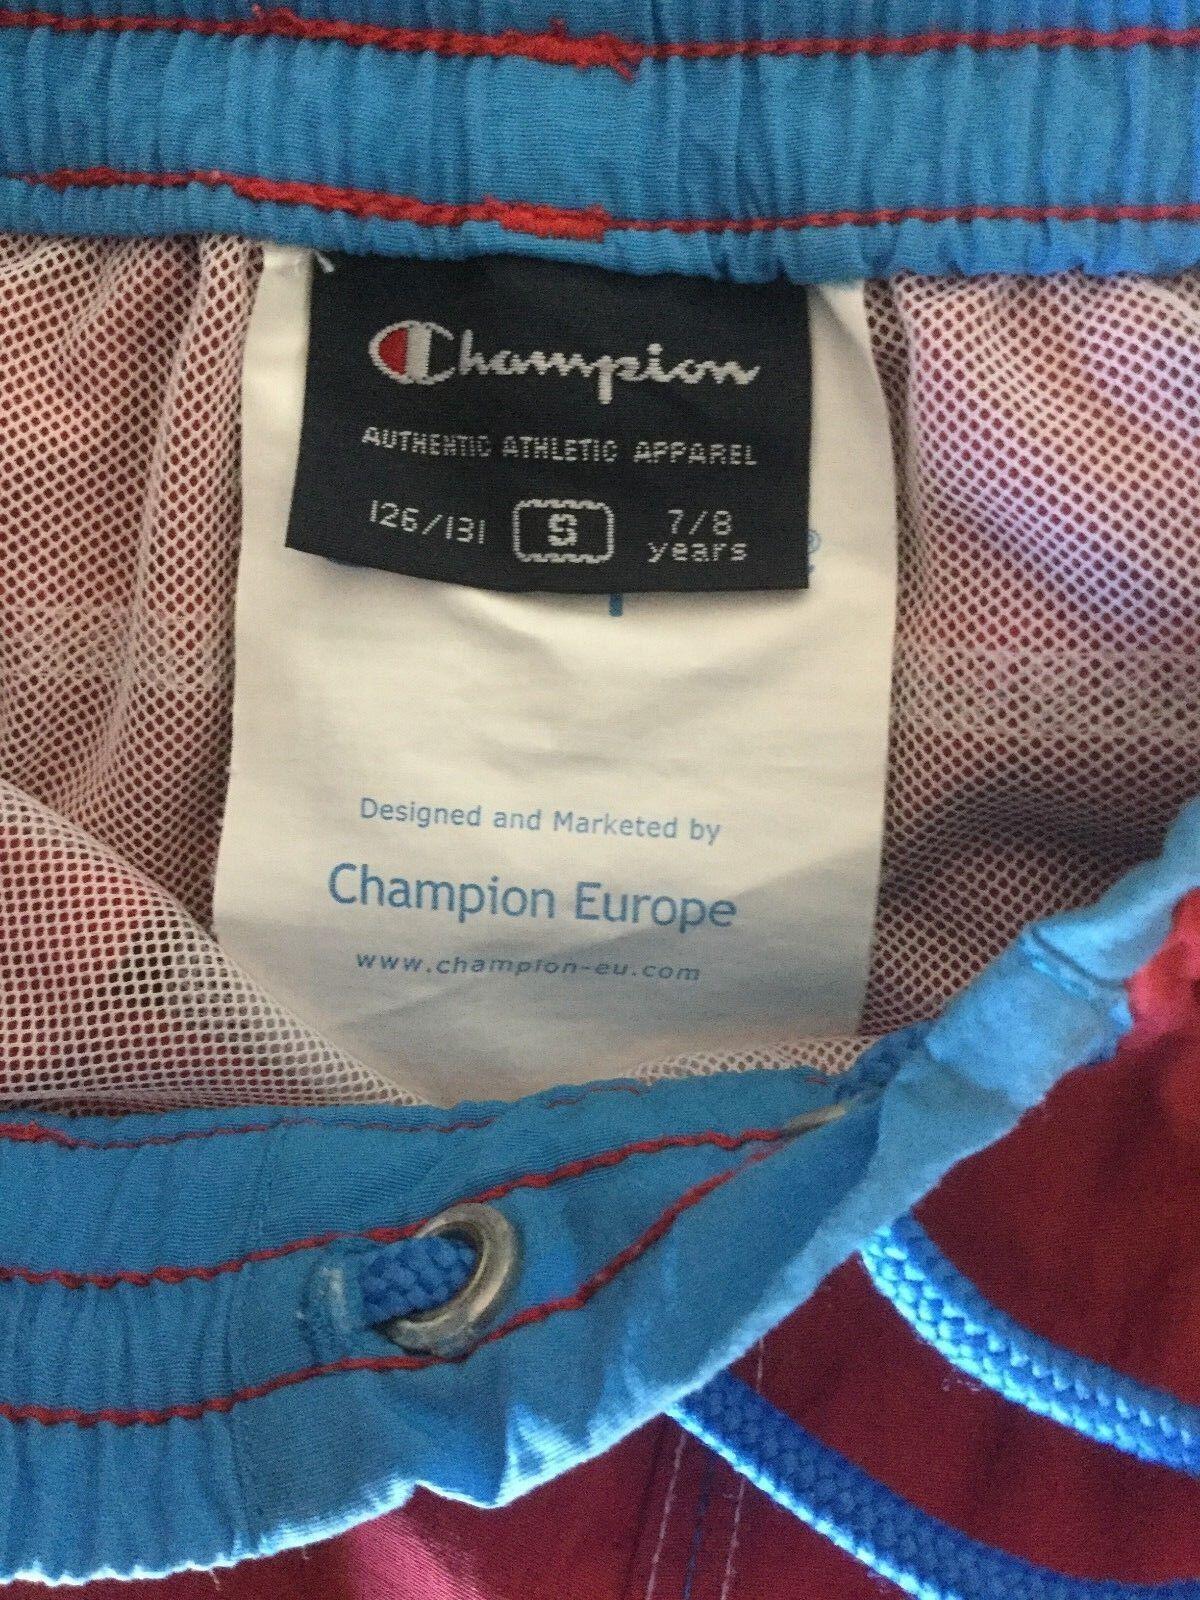 Champion pantaloncino da mare shorts by sea size costume bambini size sea s 7-8 years b7c60a